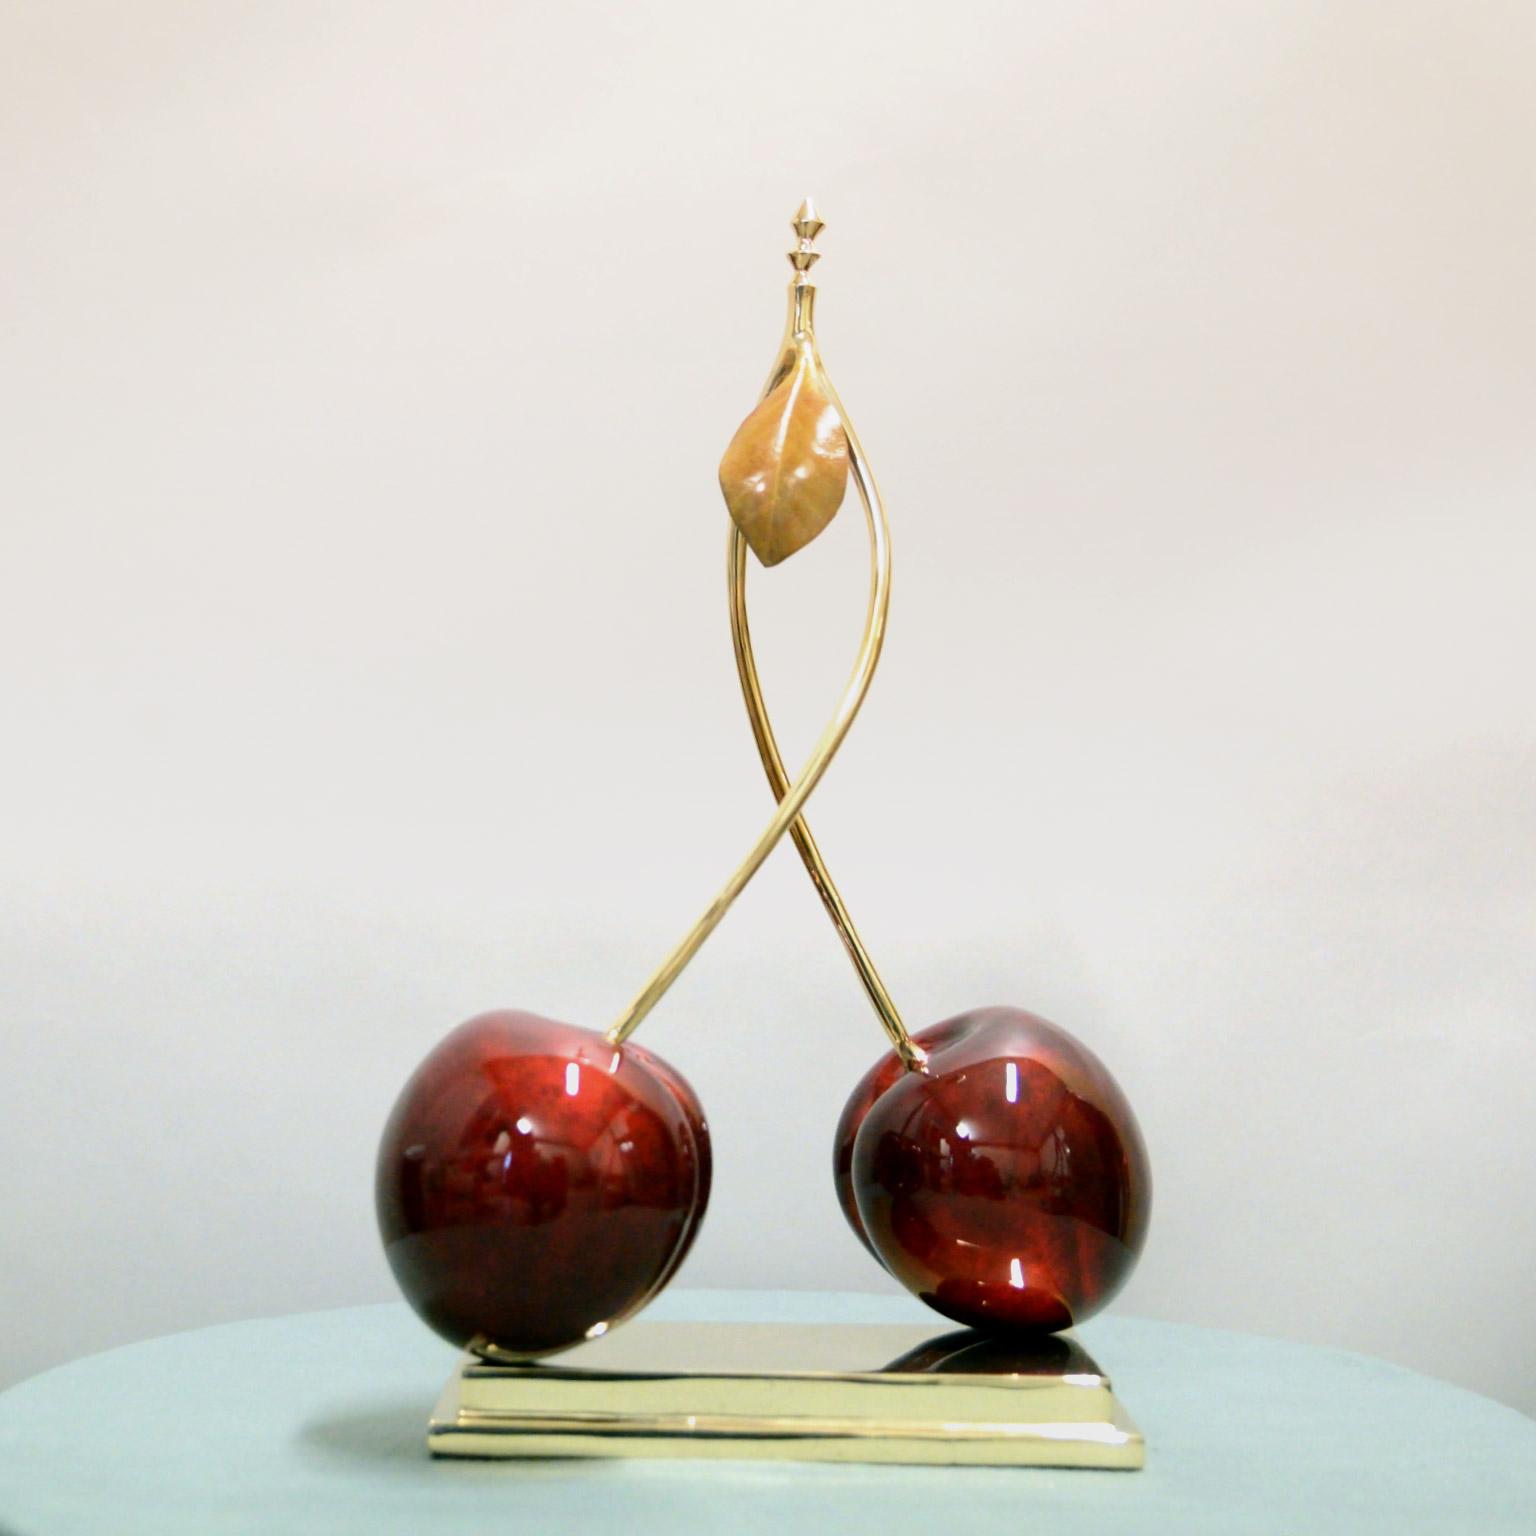 lothar-portfolio-sweet-heart-midi-50-x-34-cm